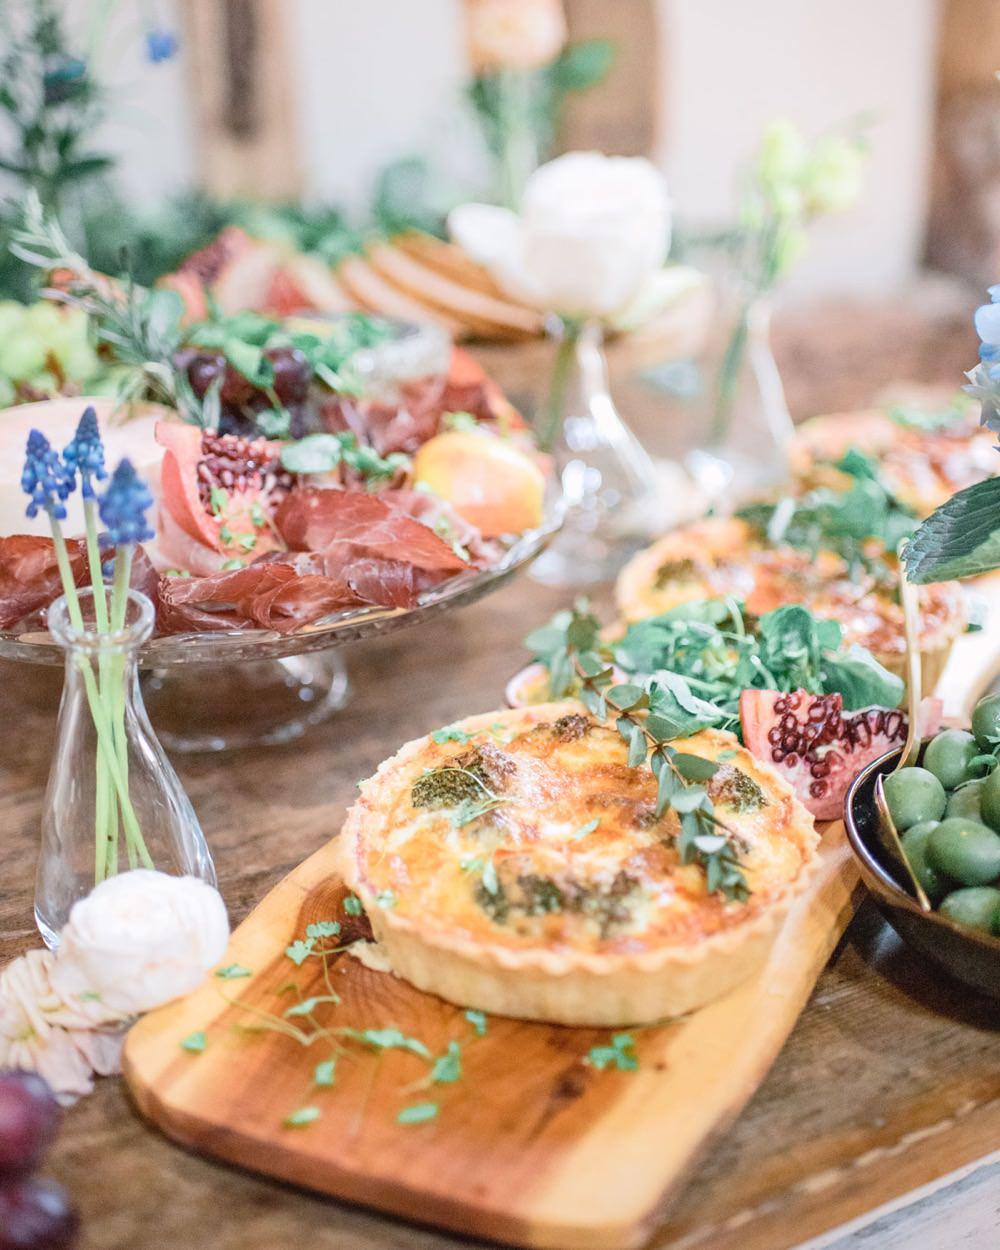 Grazing Station Boards Platter Food Elegant Wedding Ideas Yll Weddings